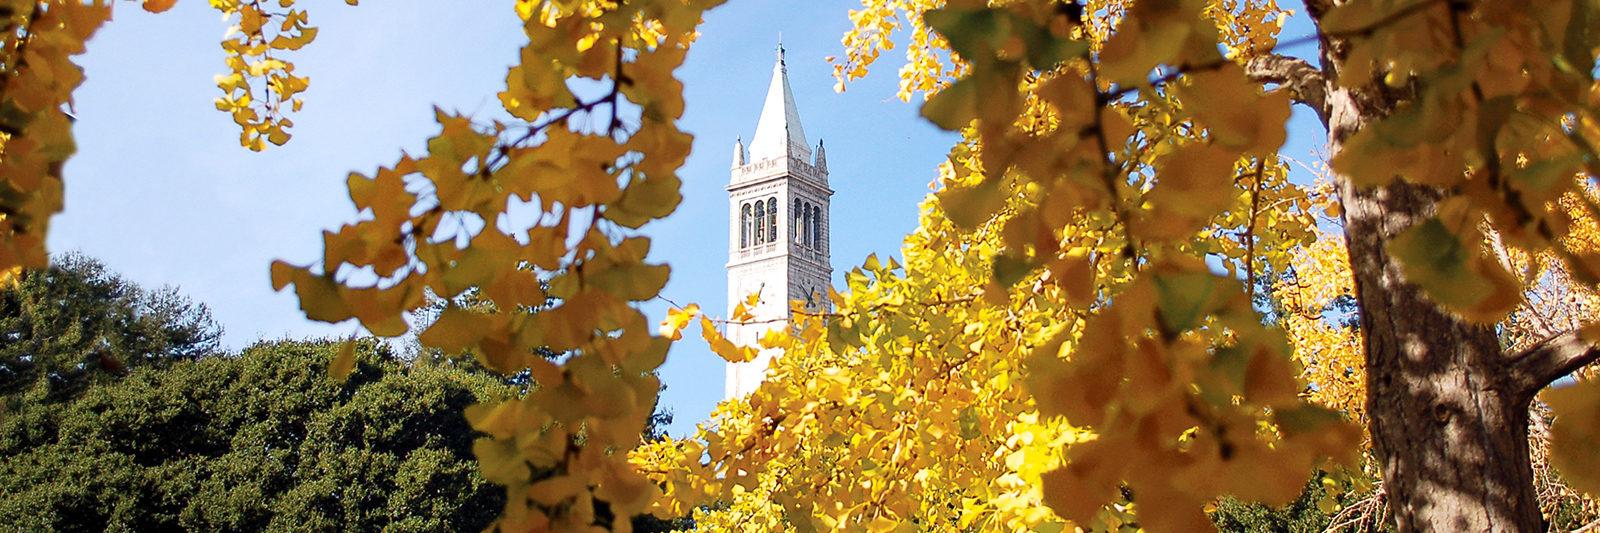 campanile in fall photo